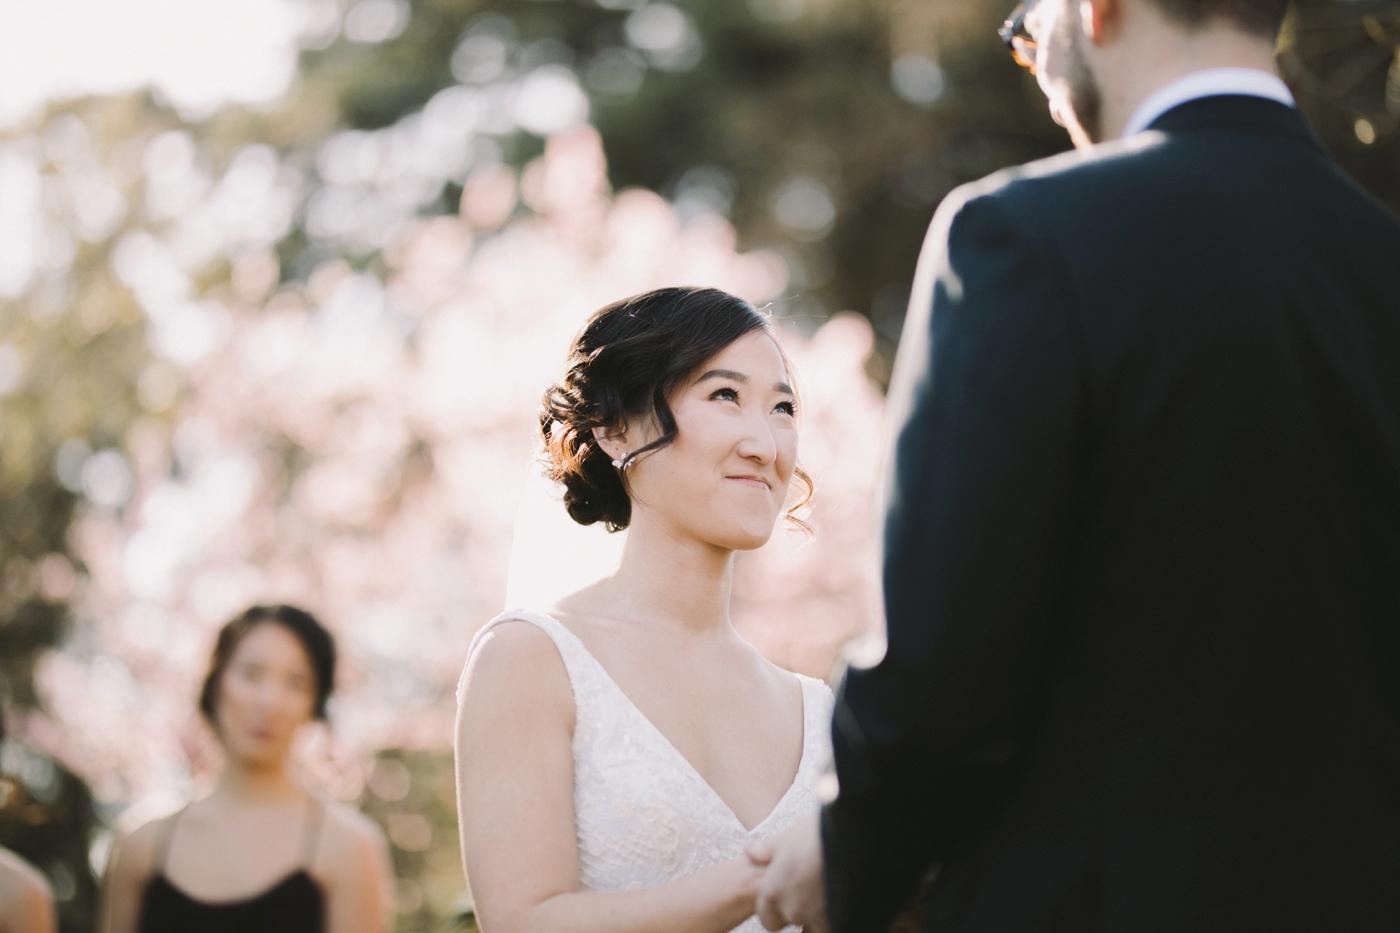 Adelaide Wedding Photographer - Al Ru Farm Wedding in Adelaide - Natural Wedding Photography Australia - www.katherineschultzphotography.com - Todd & Rachel_0030.jpg